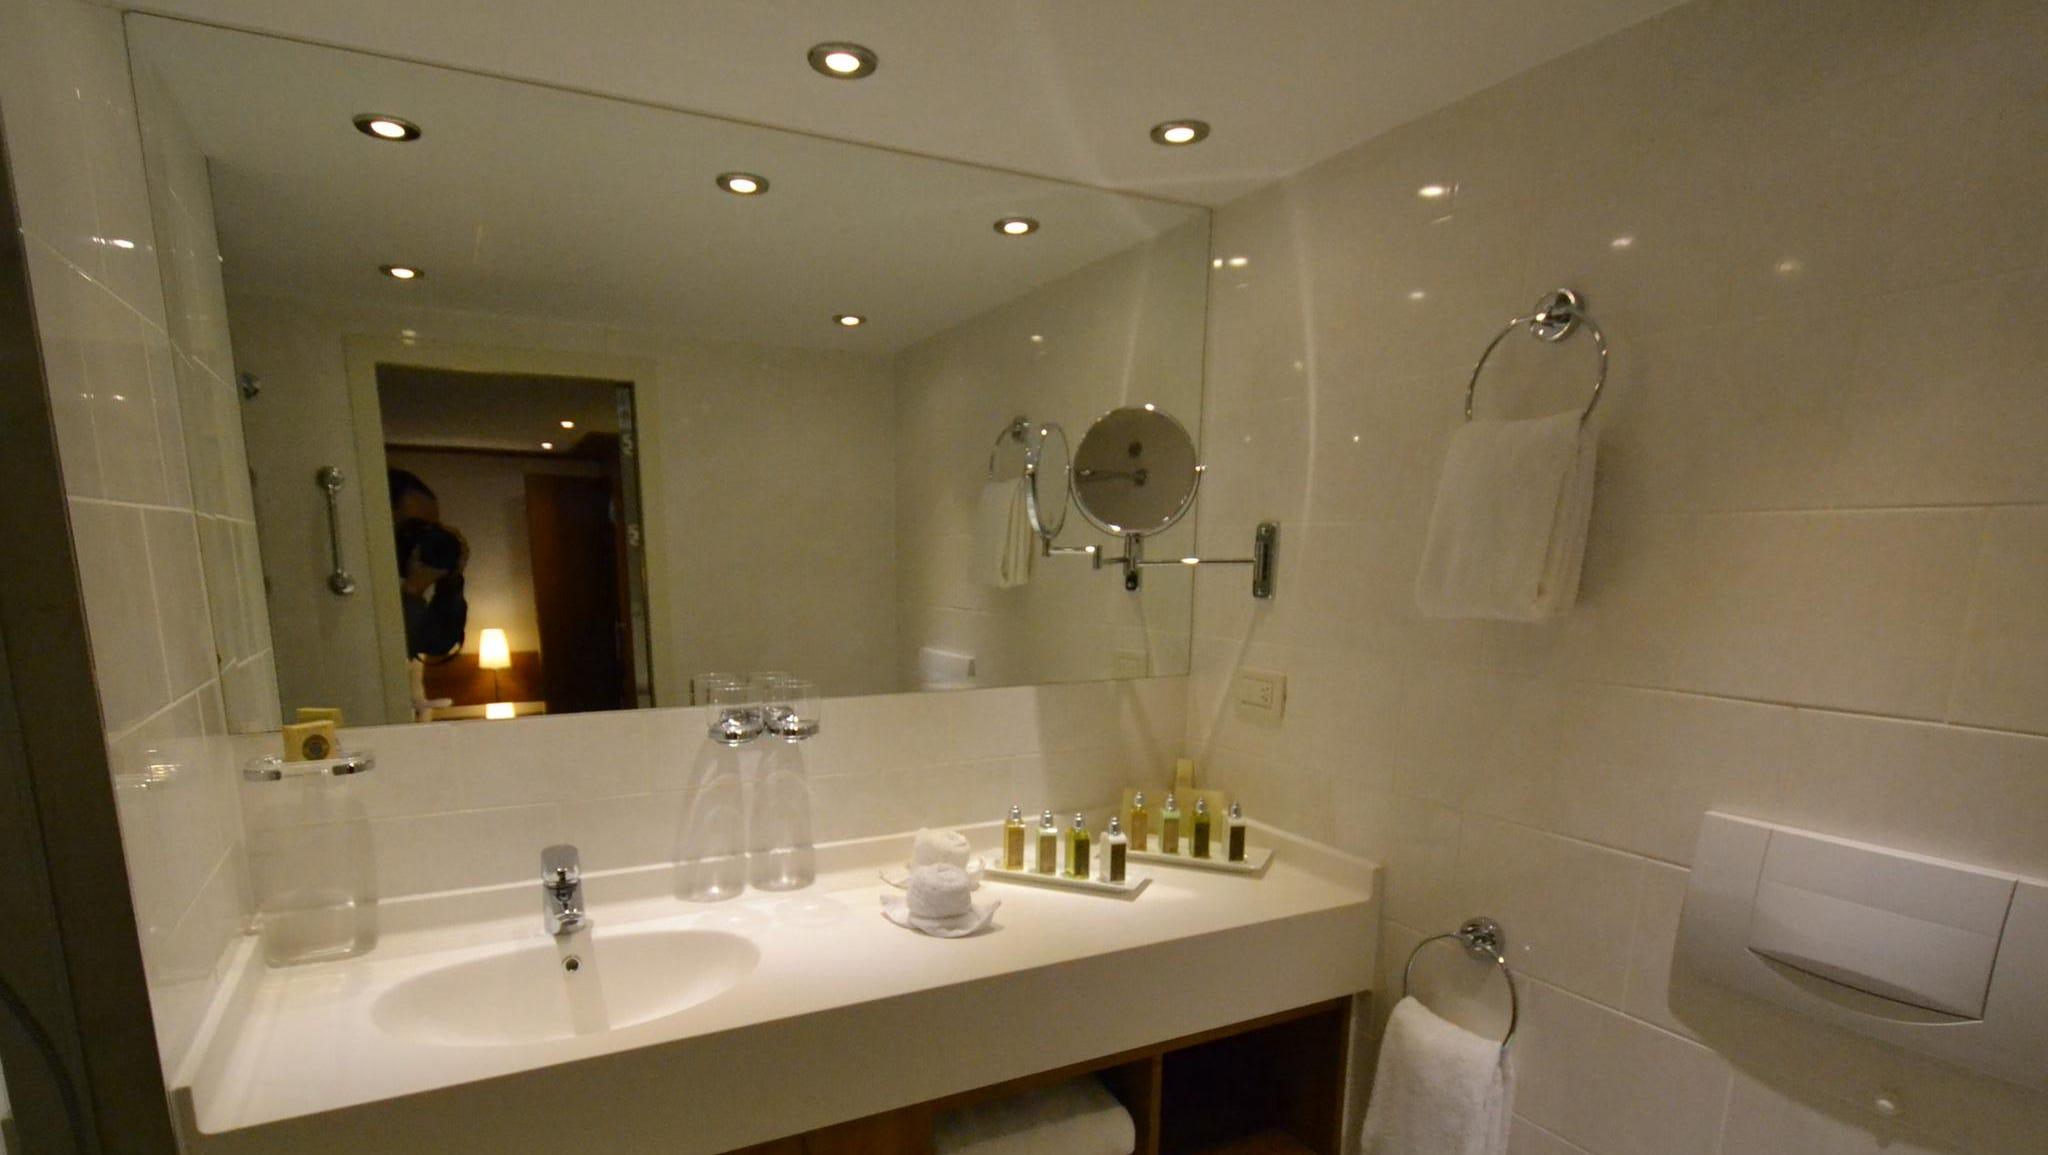 A Deluxe Suite bathroom.